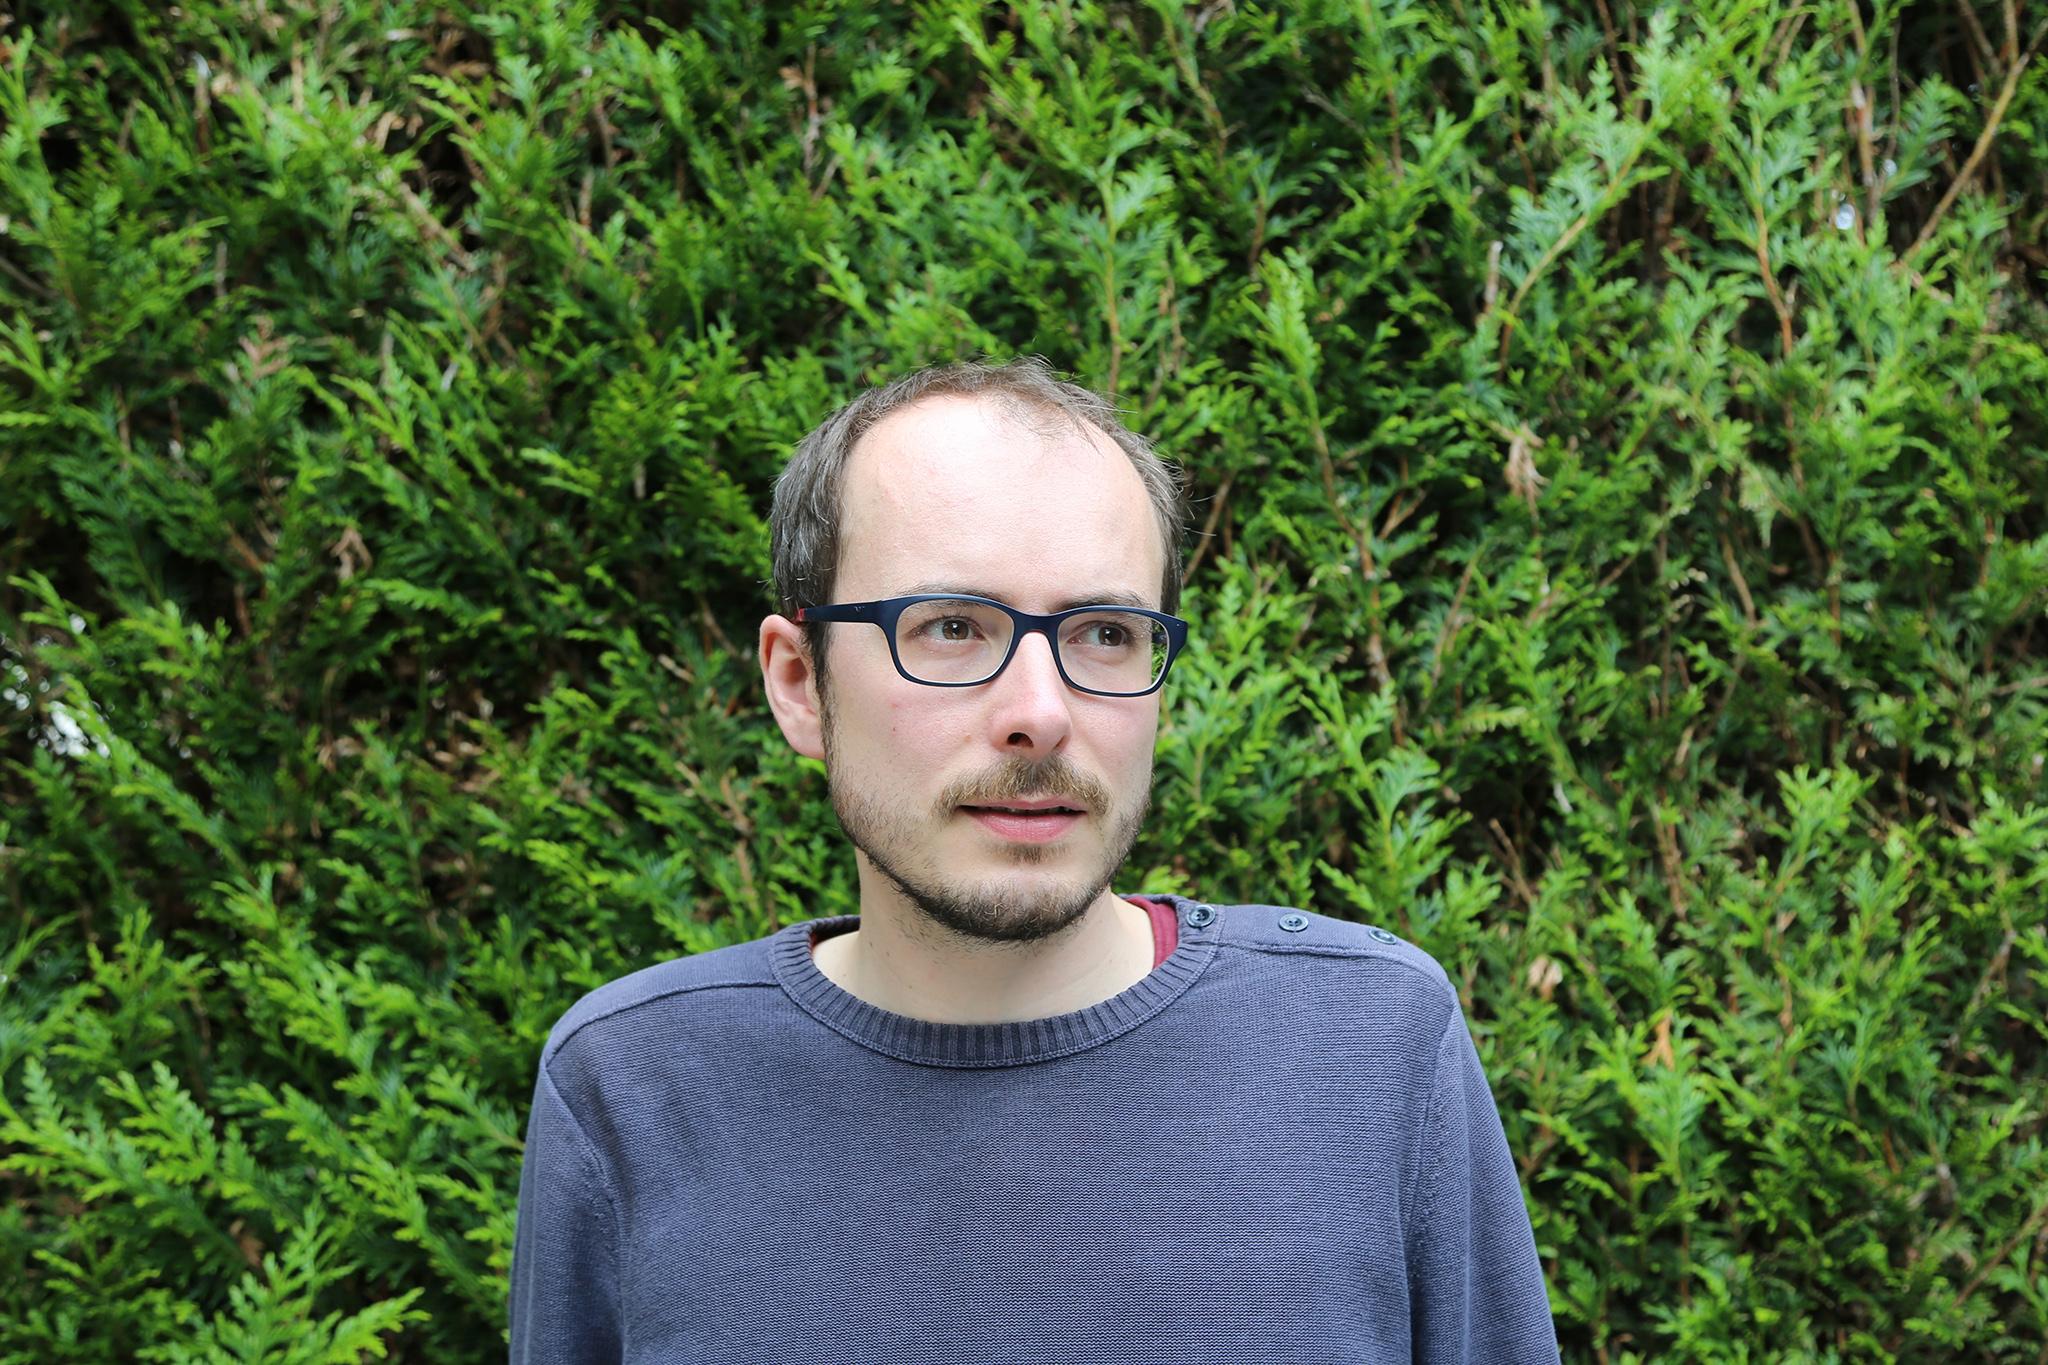 AntoineDPortrait.JPG